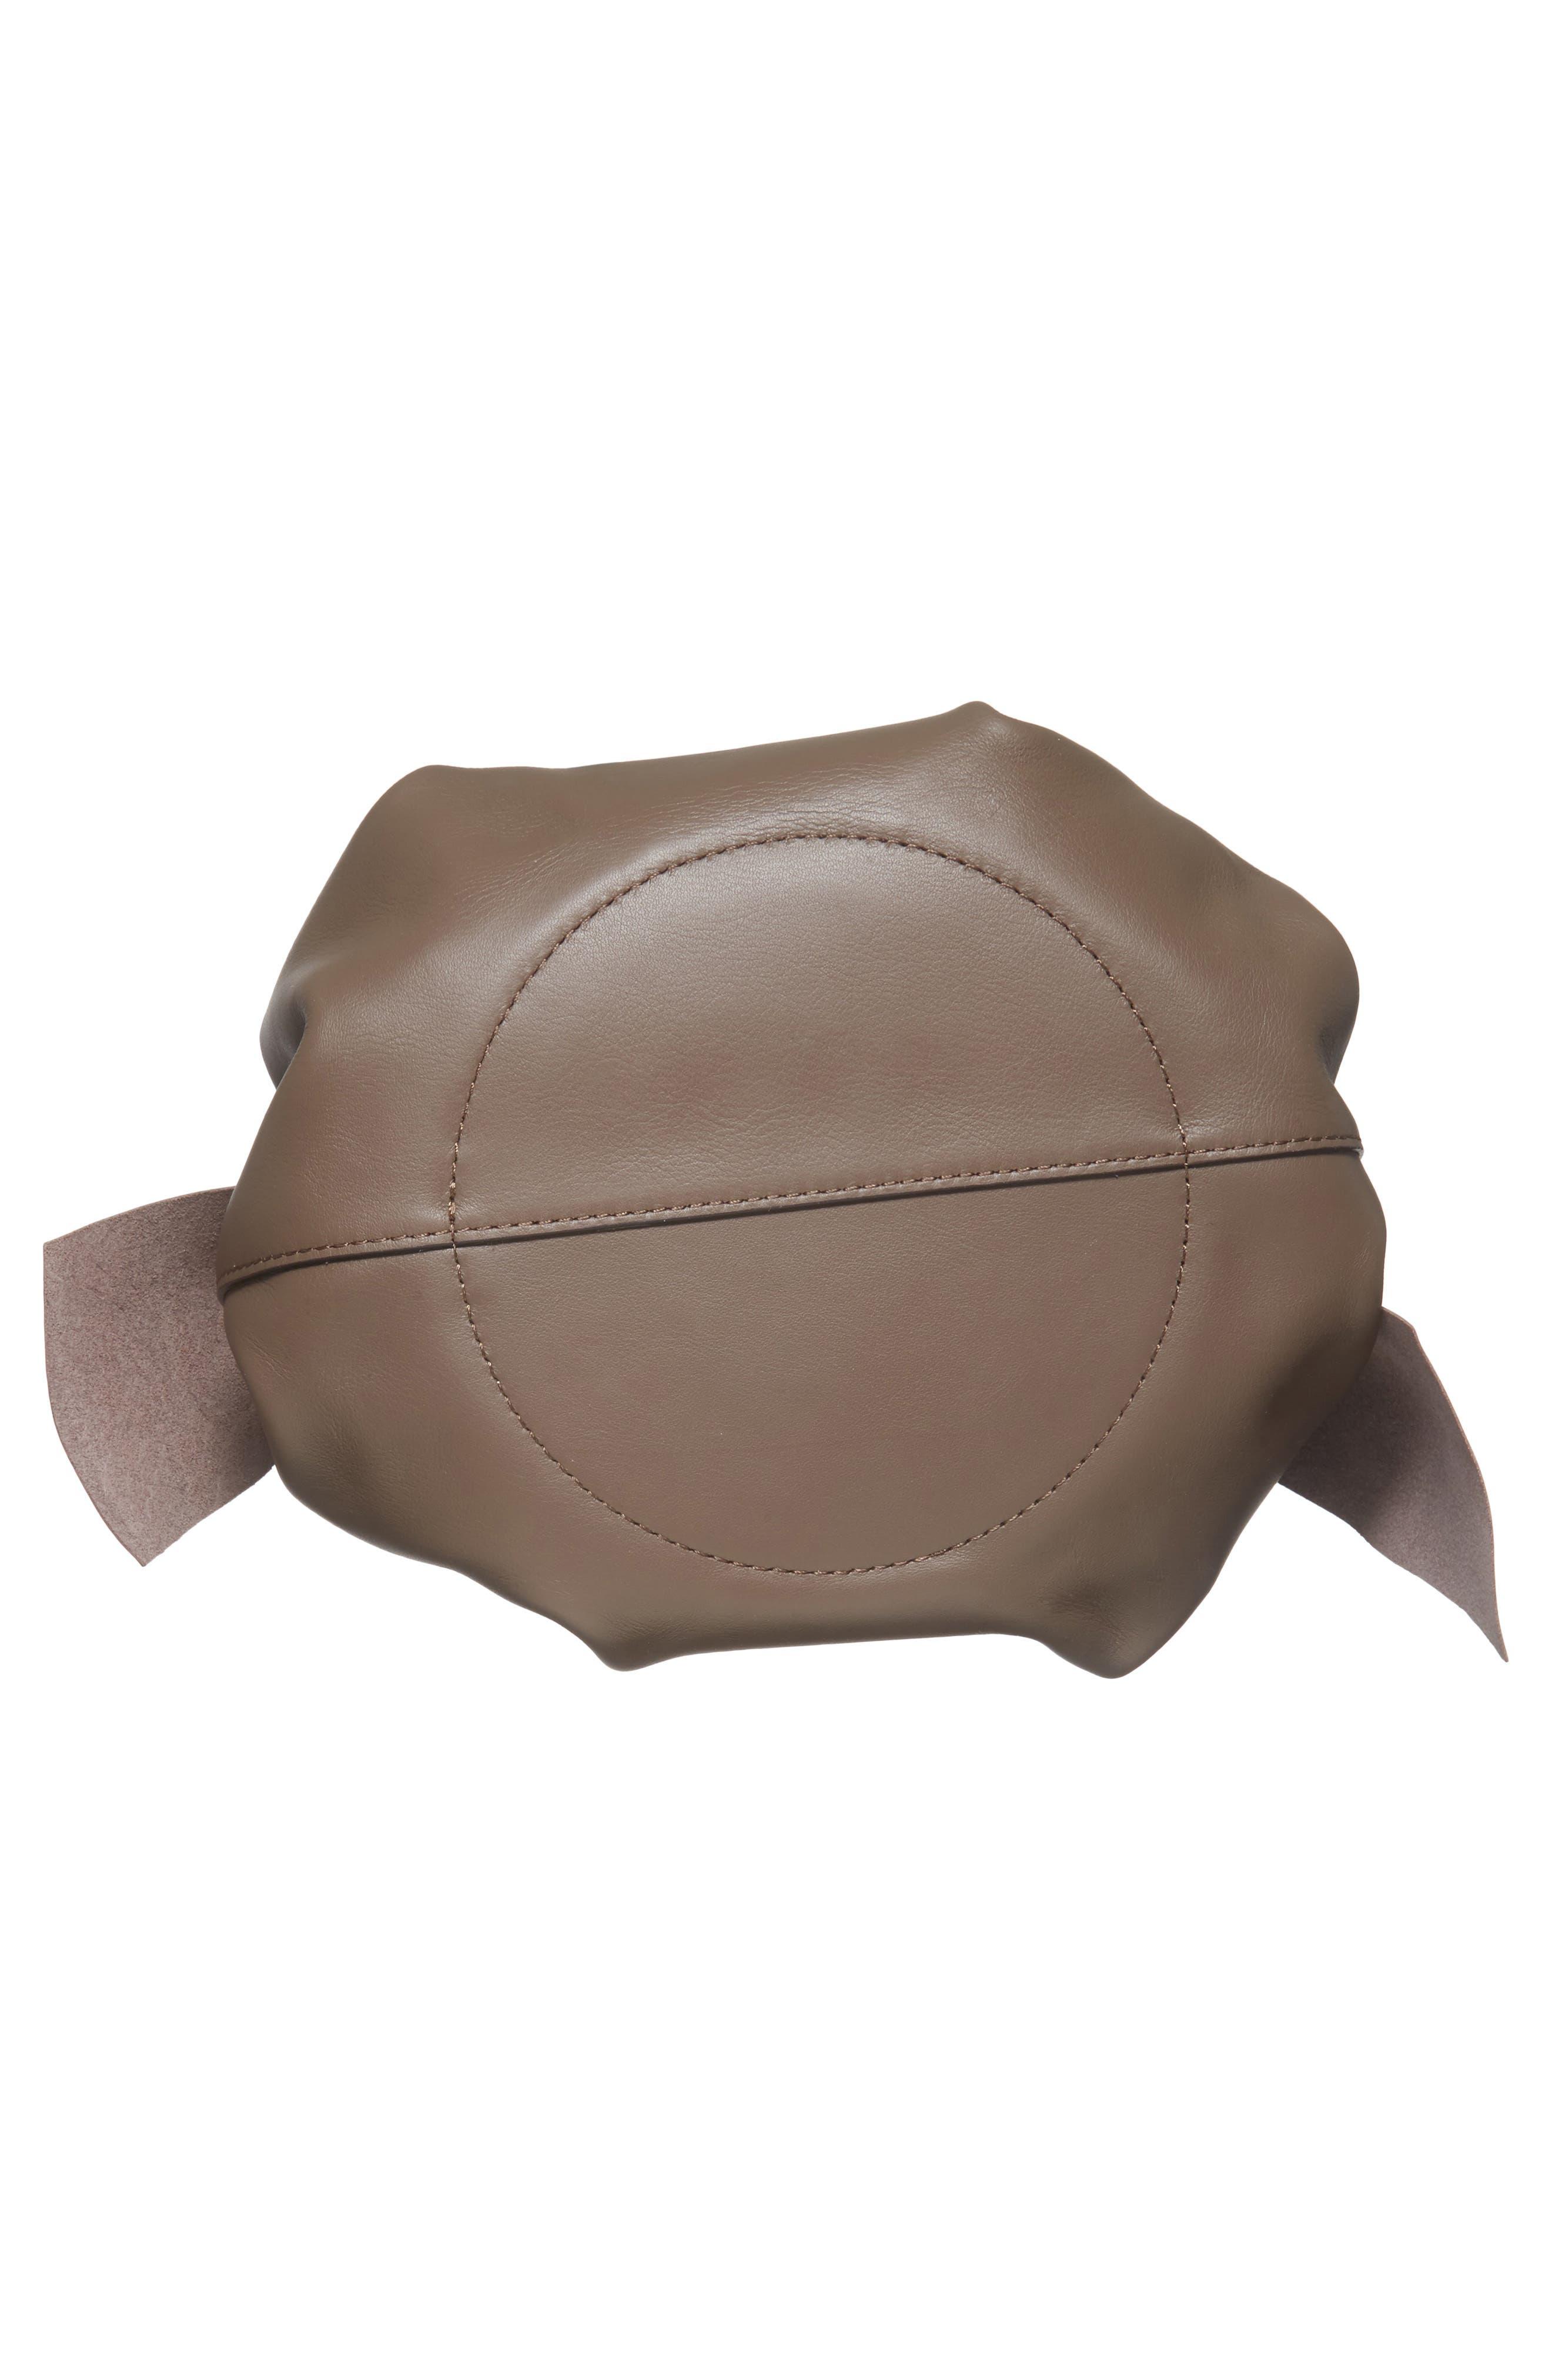 Soiree Leather Crossbody Bag,                             Alternate thumbnail 5, color,                             Mockingbird